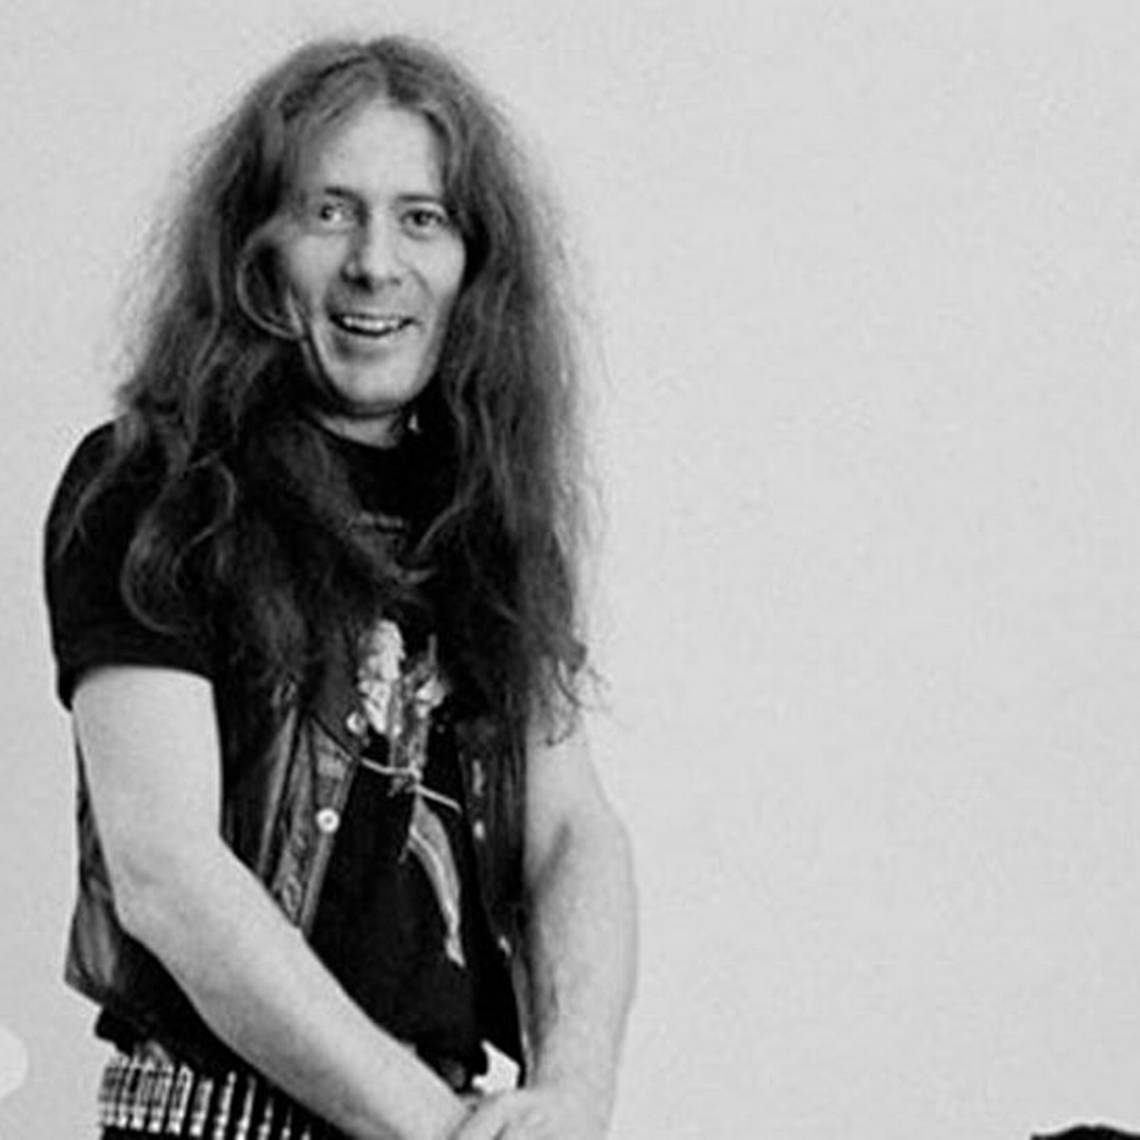 Muere Eddie Clarke, fundador de Motorhead